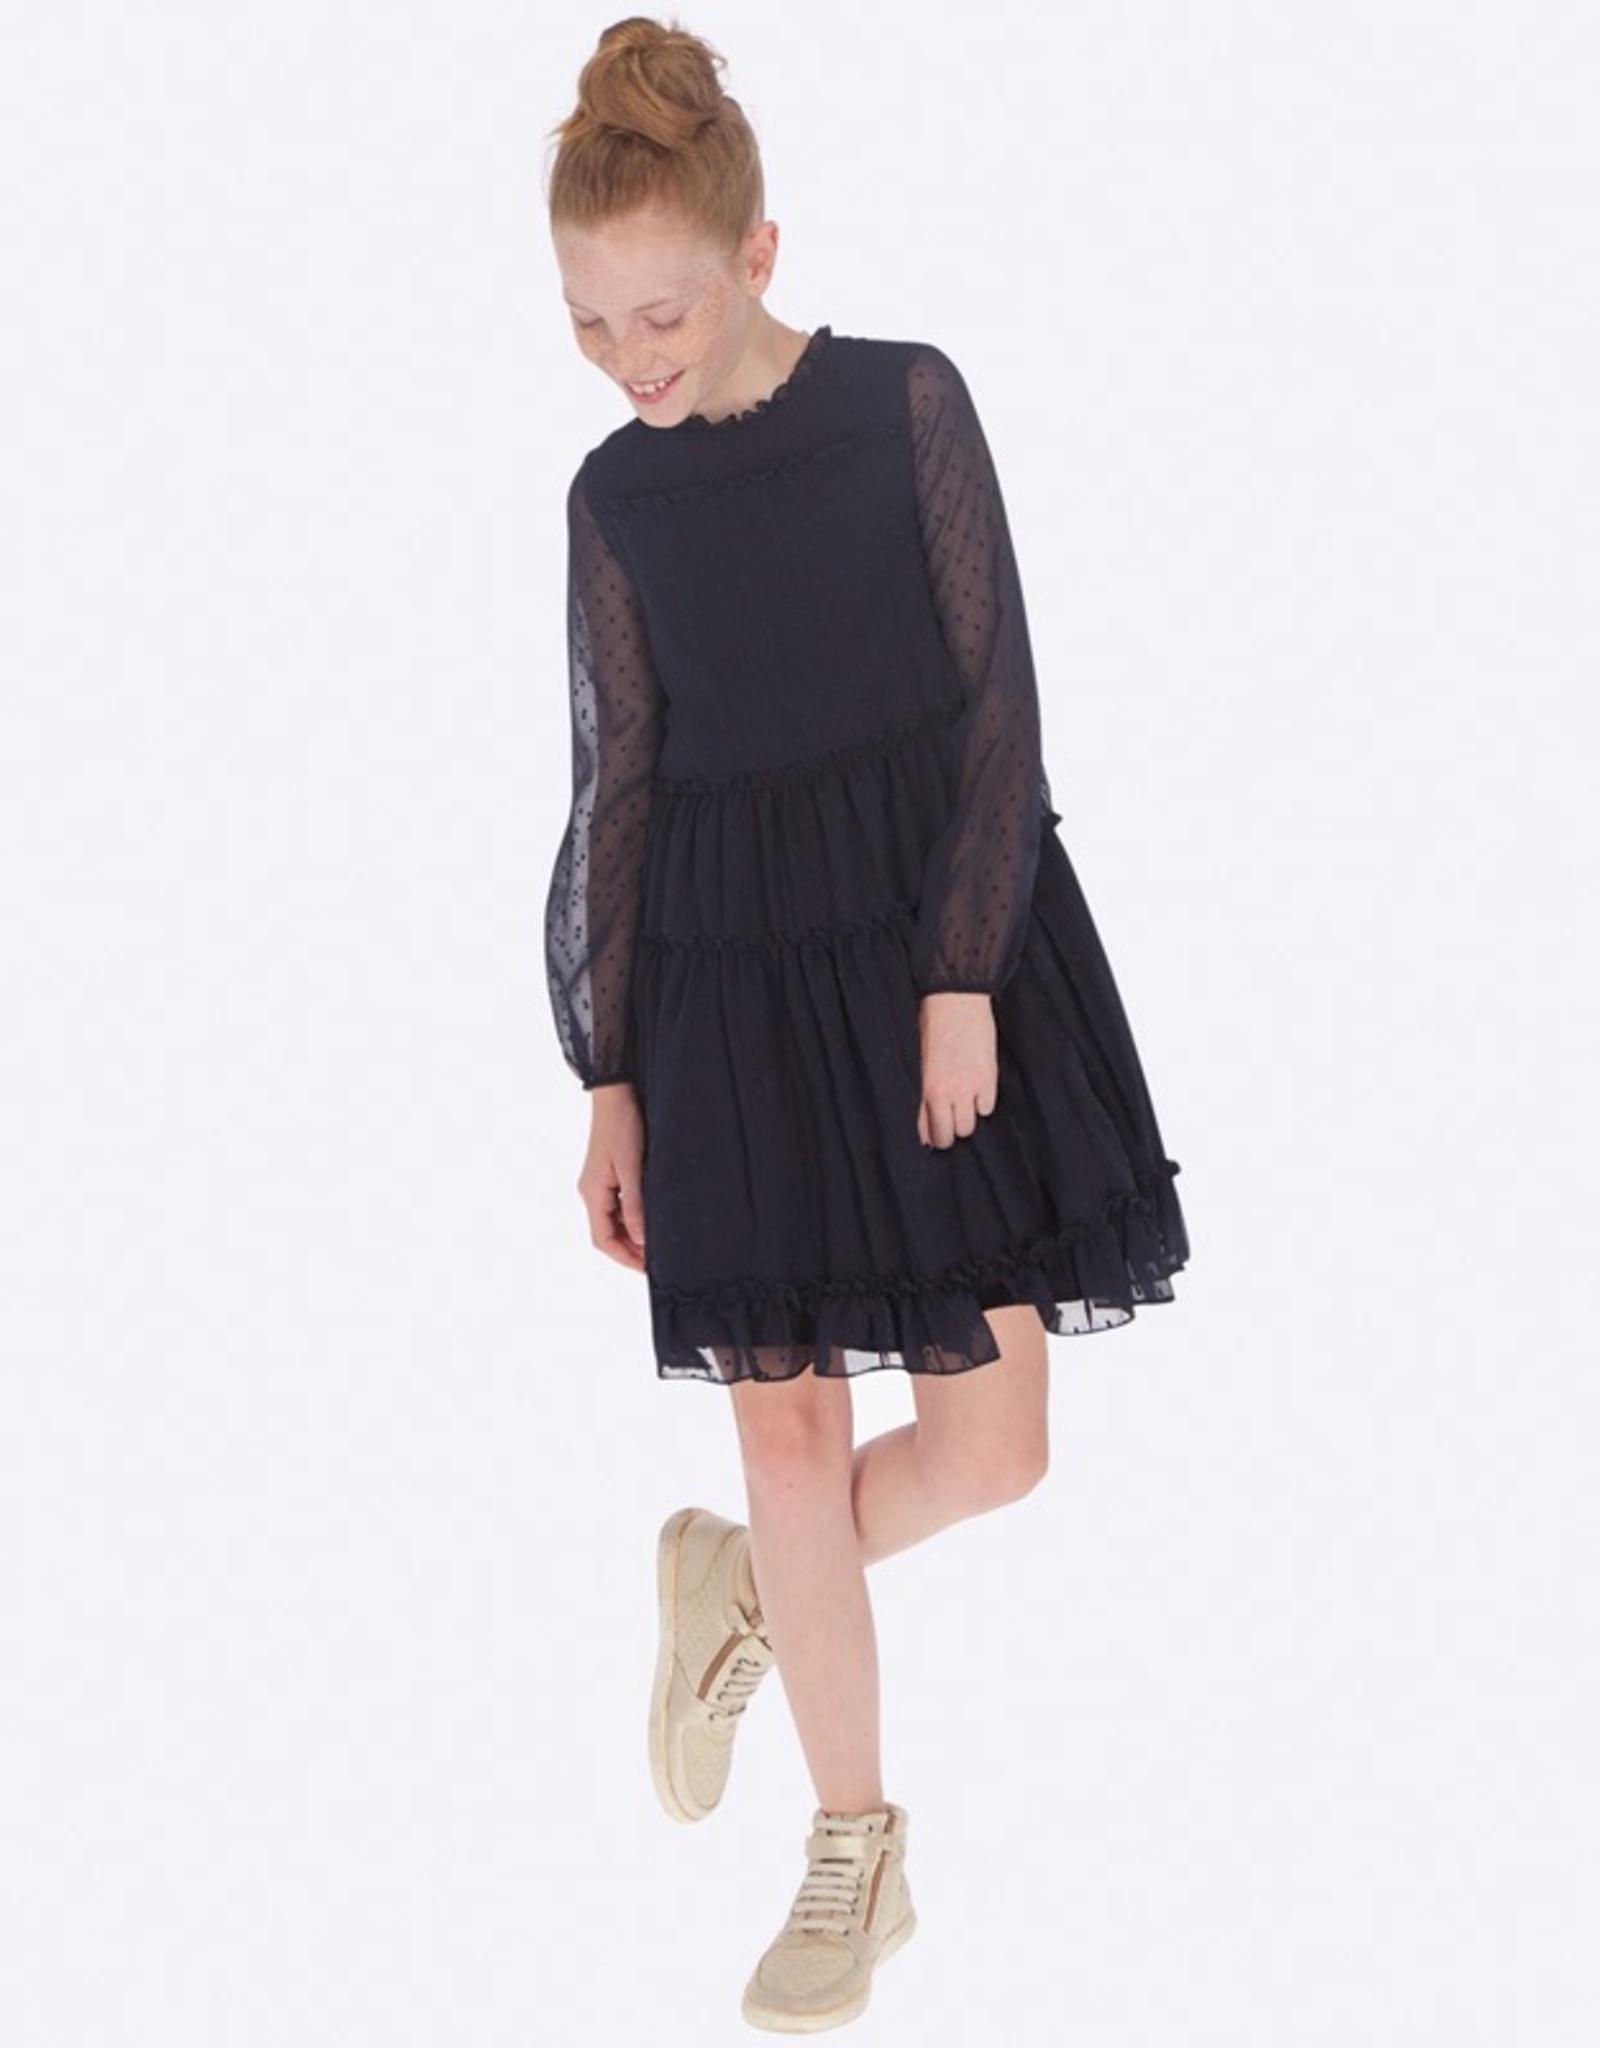 Mayoral Printed Dress for Girl